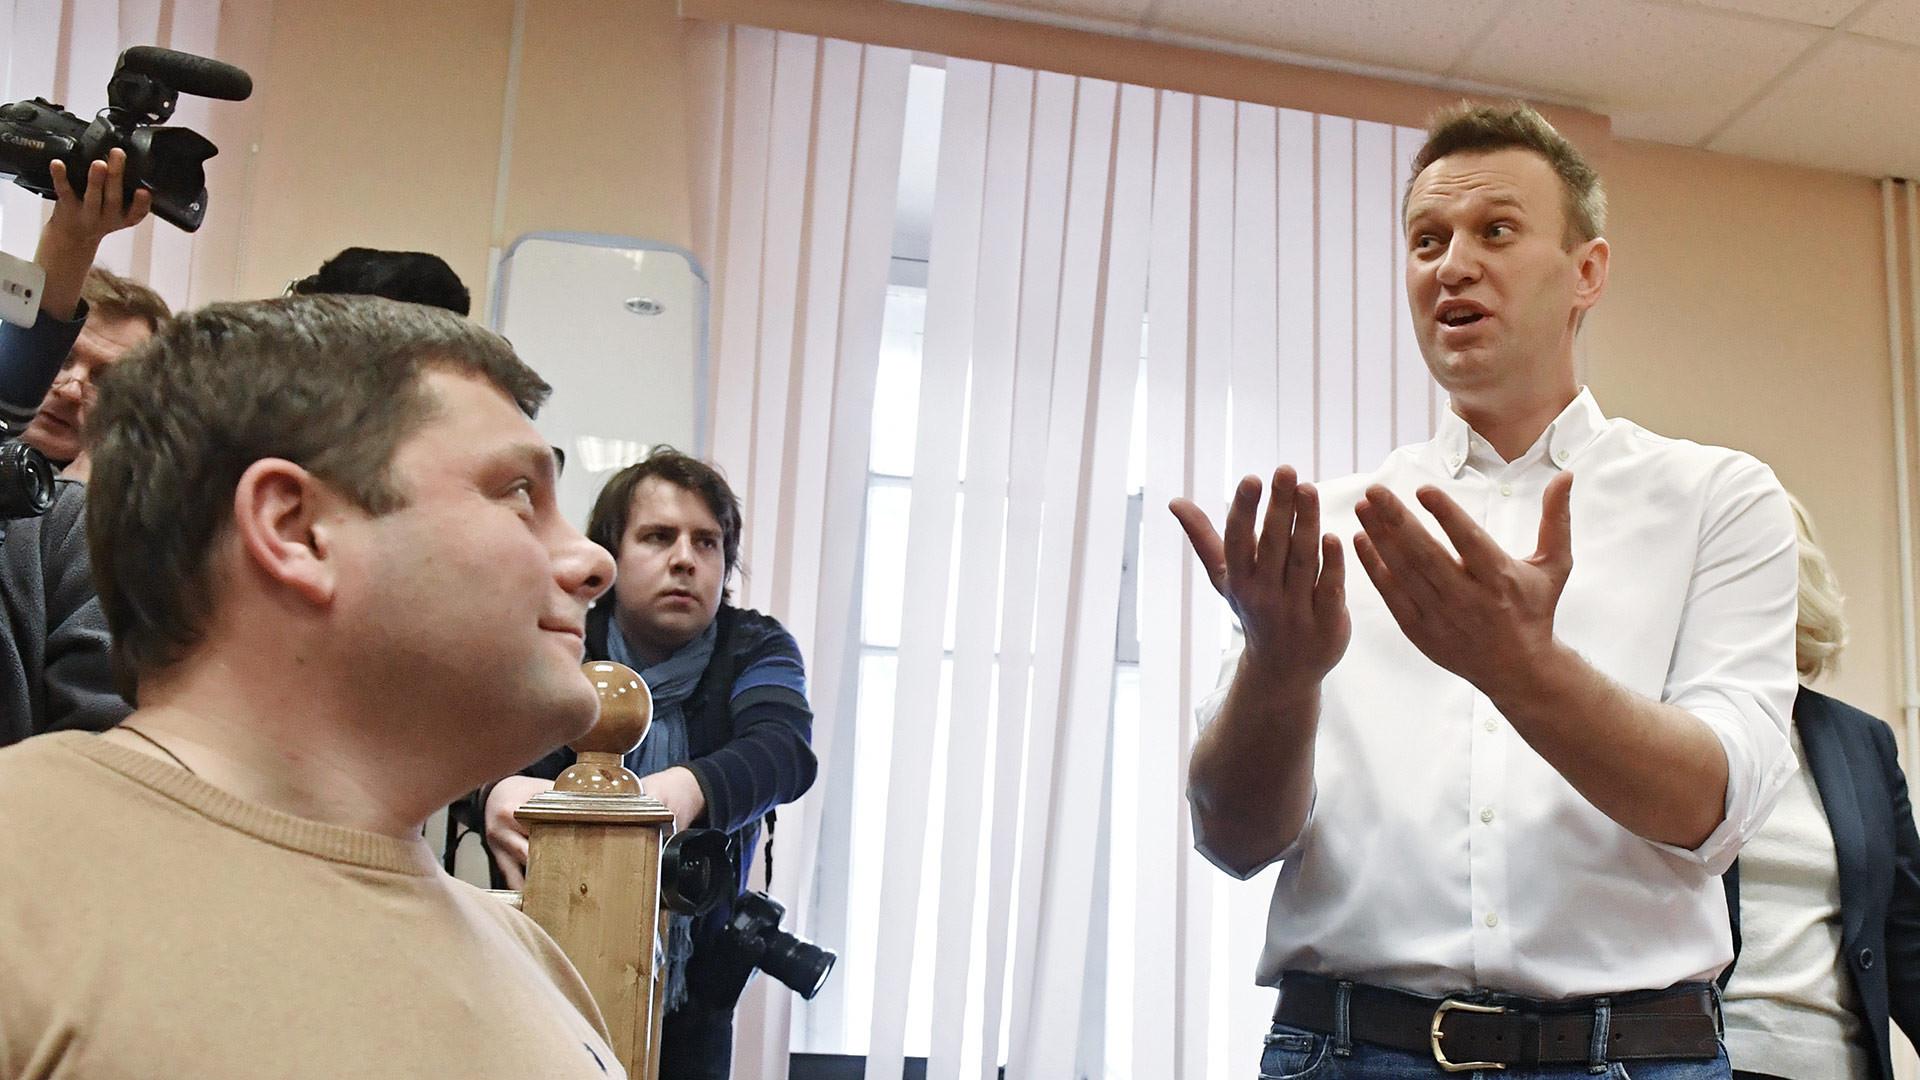 <p><span>Фото &copy; РИА Новости/Алексей Куденко</span></p>